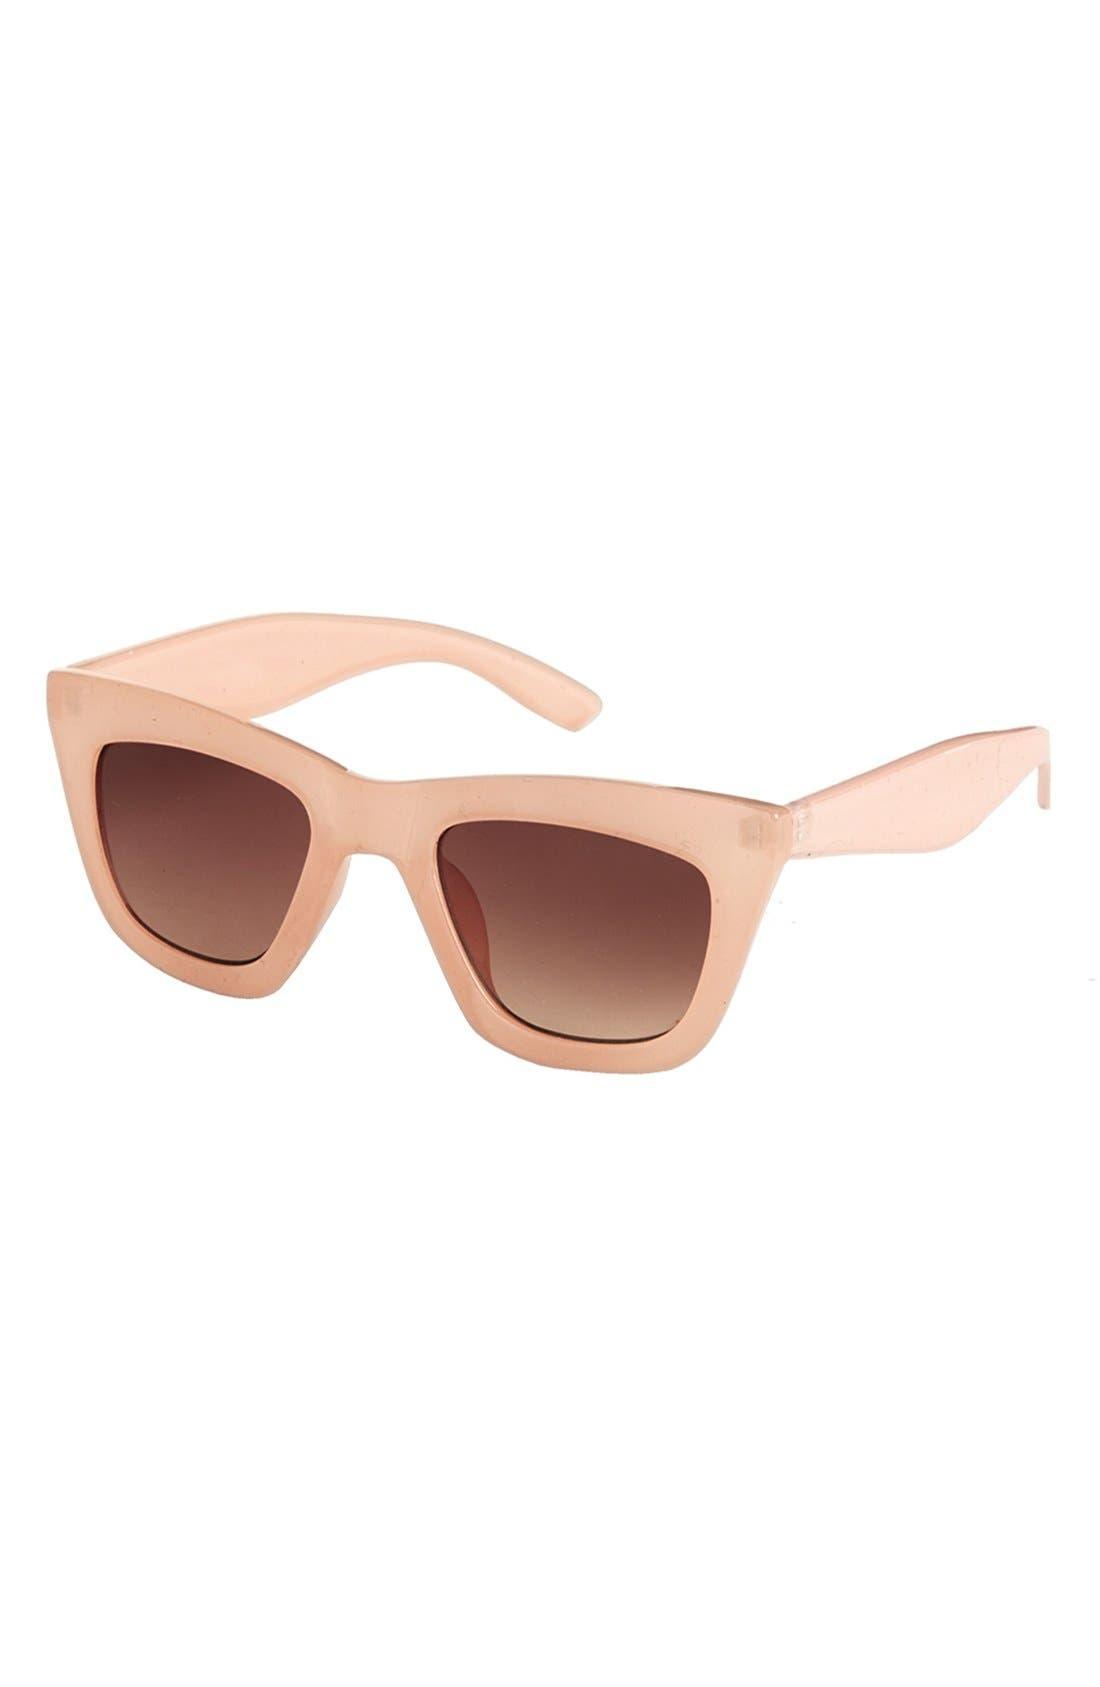 Main Image - Topshop 'Cruella' 49mm Cat Eye Sunglasses